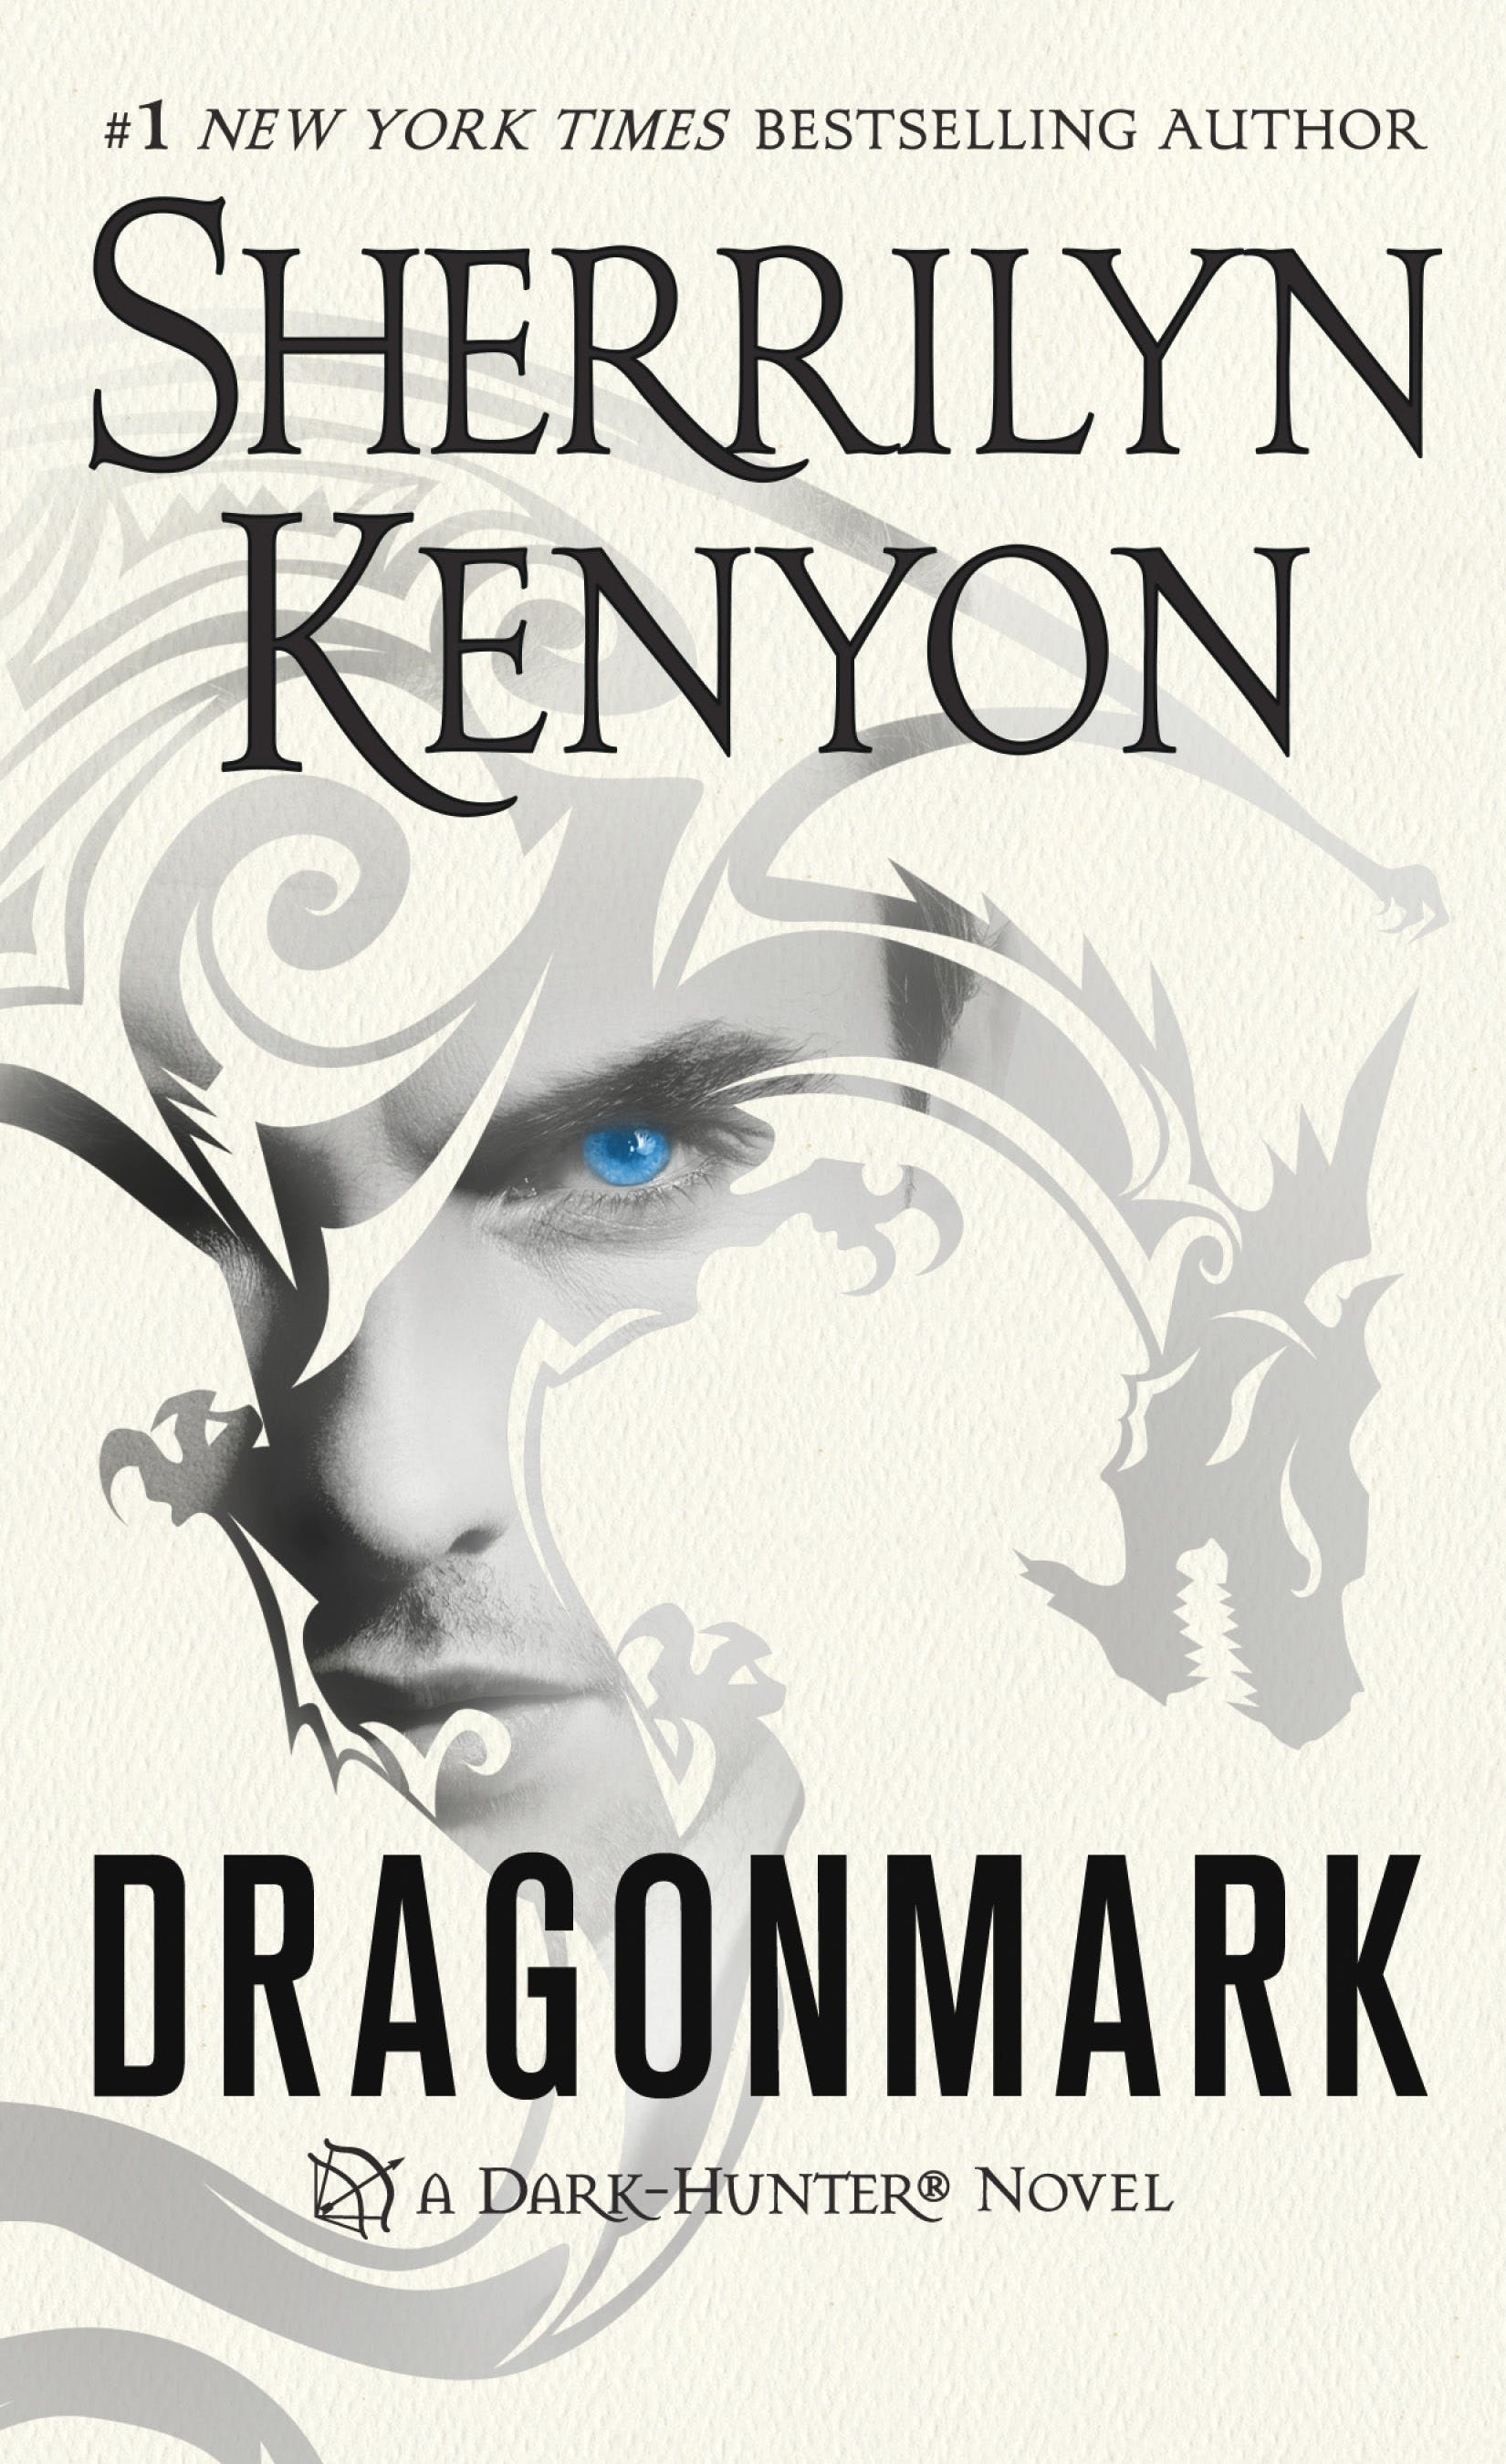 Image of Dragonmark